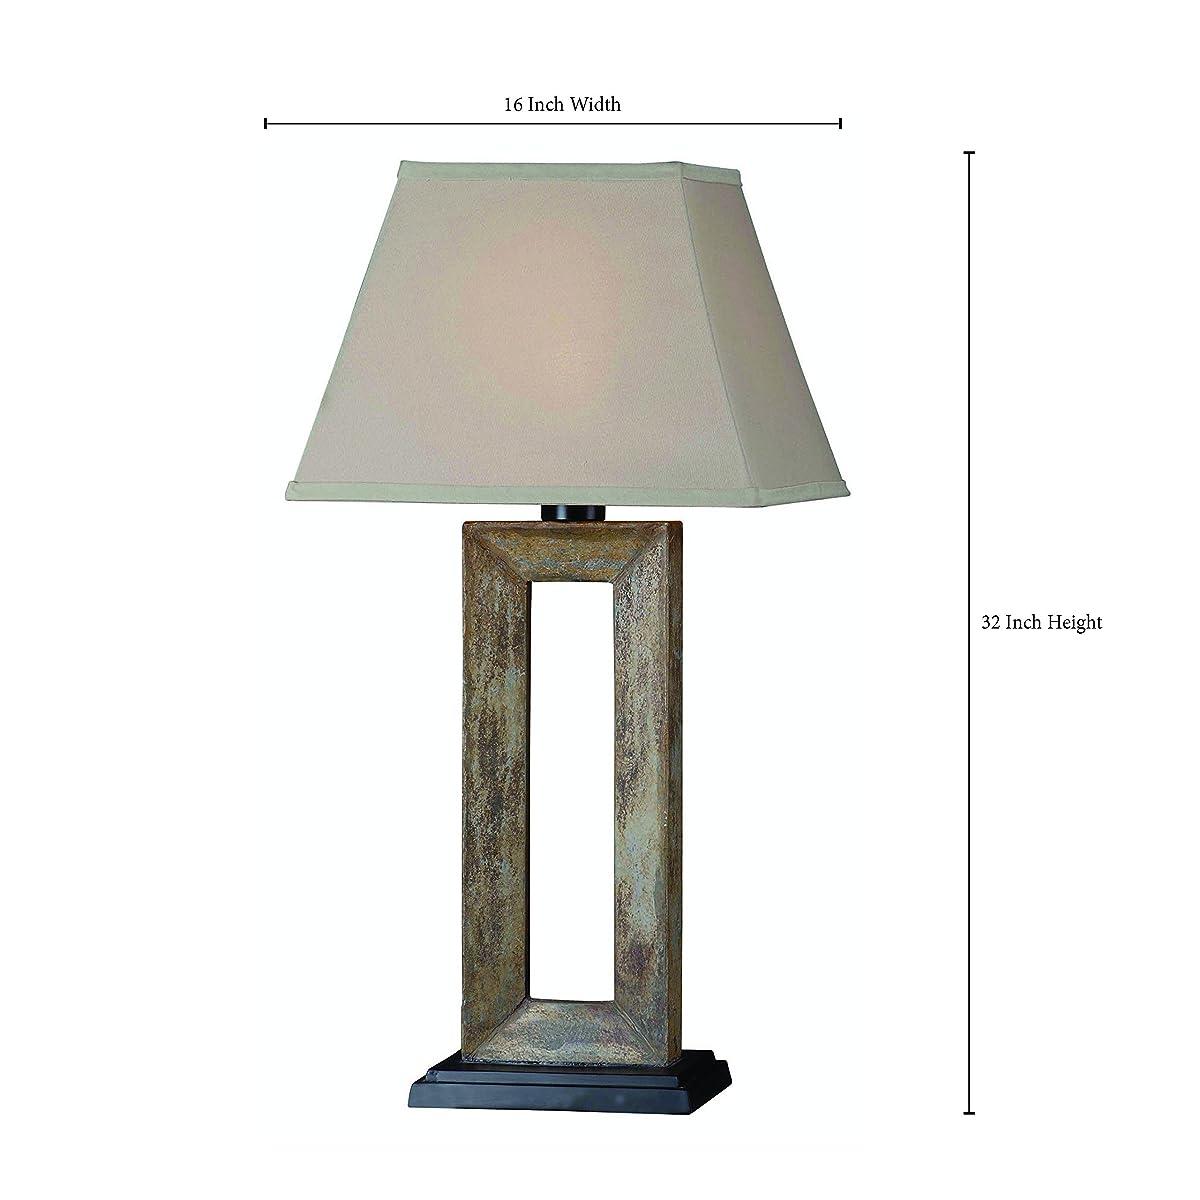 Kenroy Home 30515SL Egress Outdoor Table Lamp